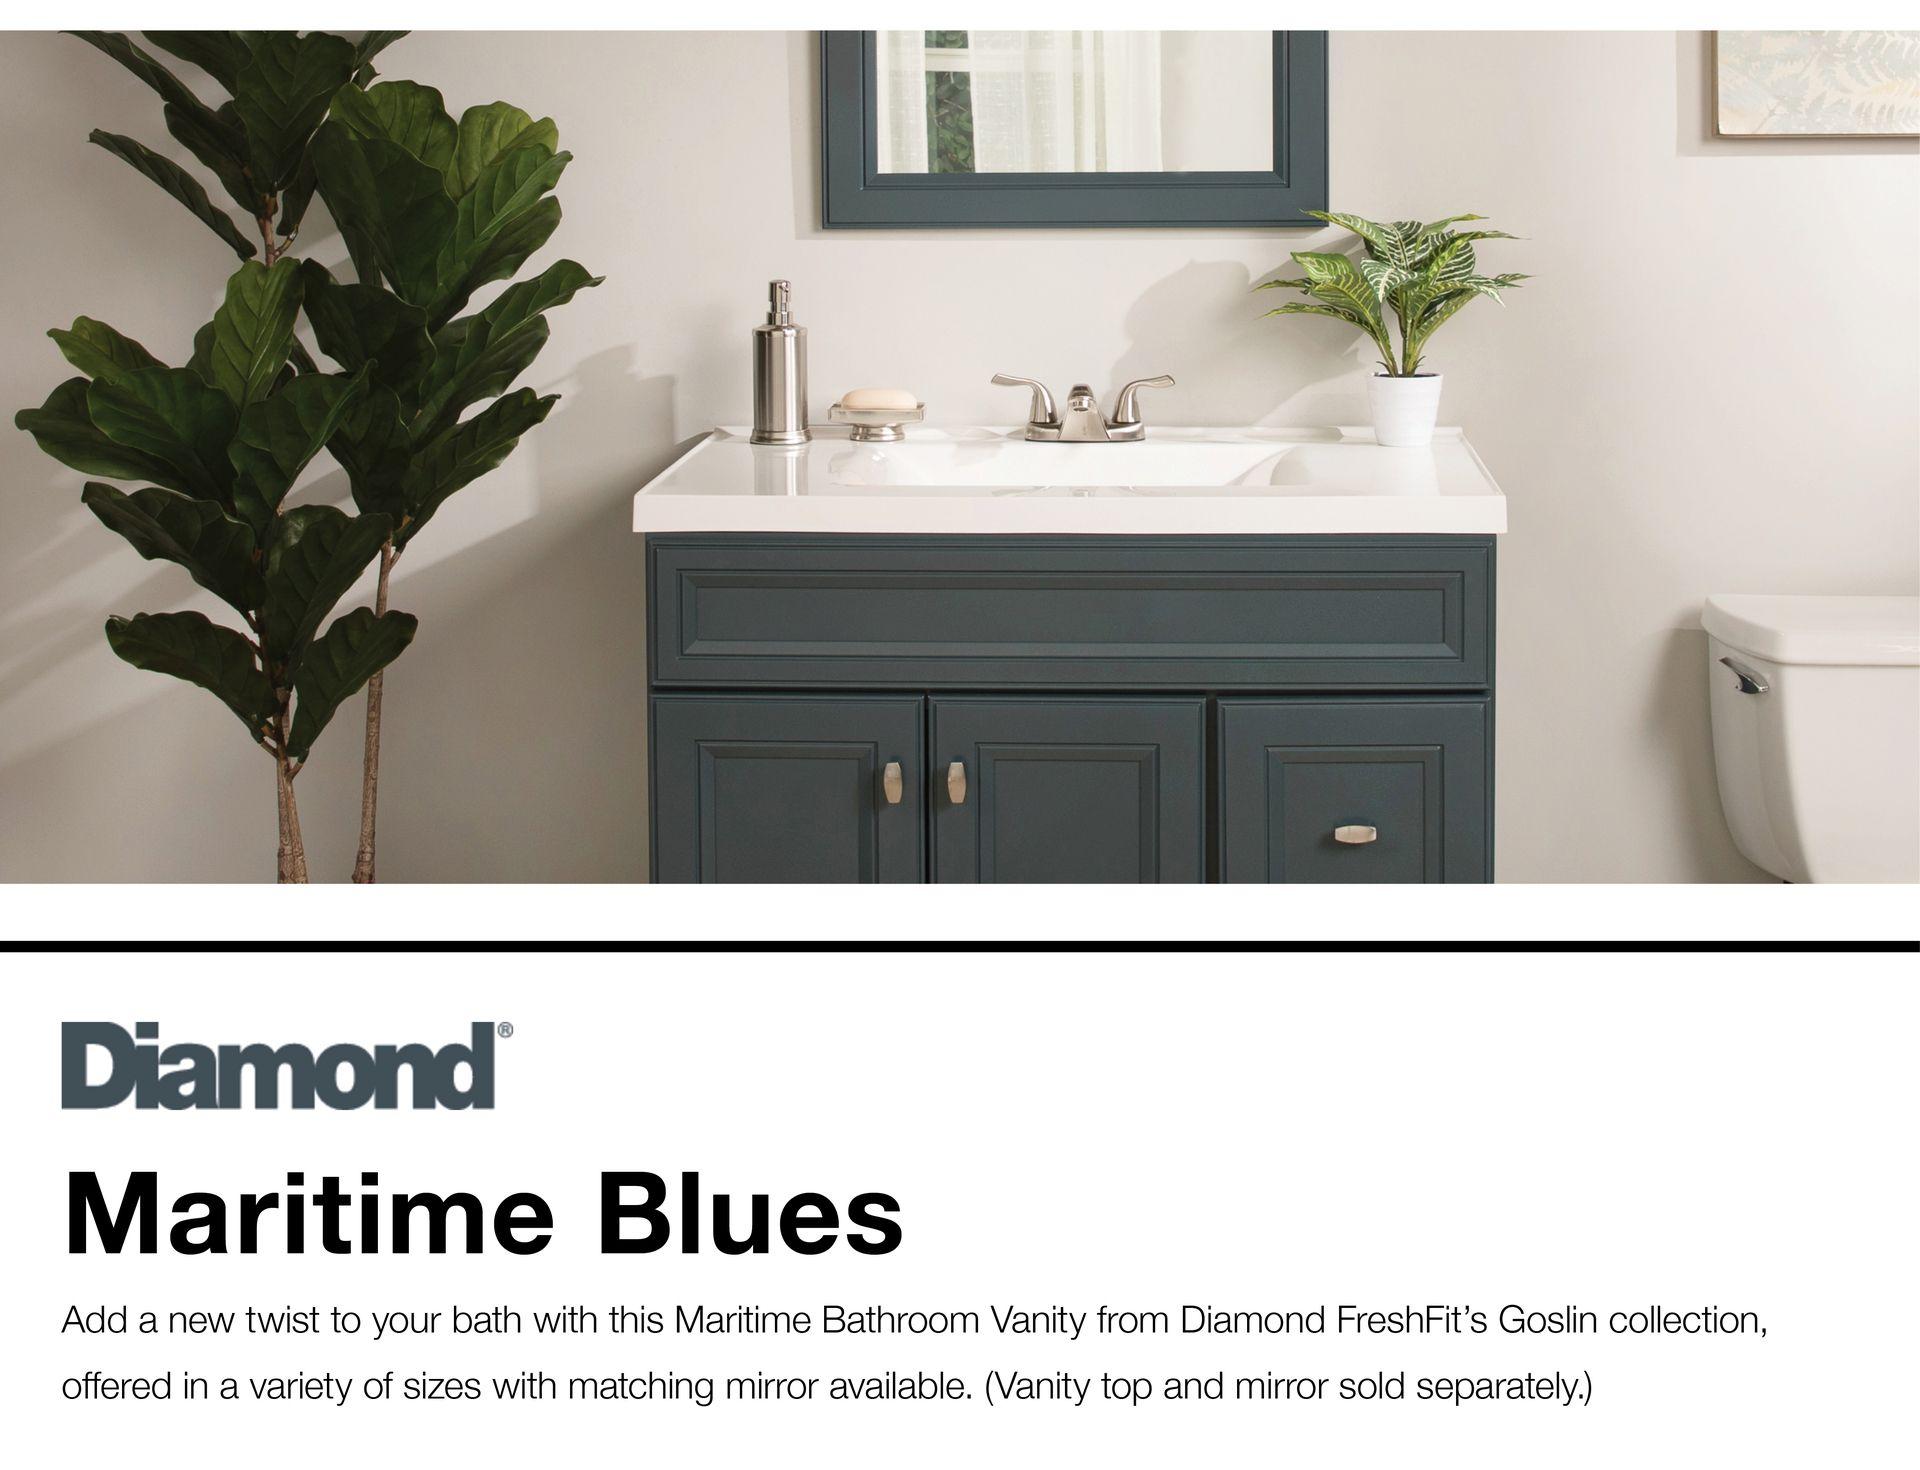 Diamond Freshfit Goslin 48 In Maritime Bathroom Vanity Cabinet Lowes Com Bathroom Vanity Cabinets Bathroom Vanity Vanity Cabinet